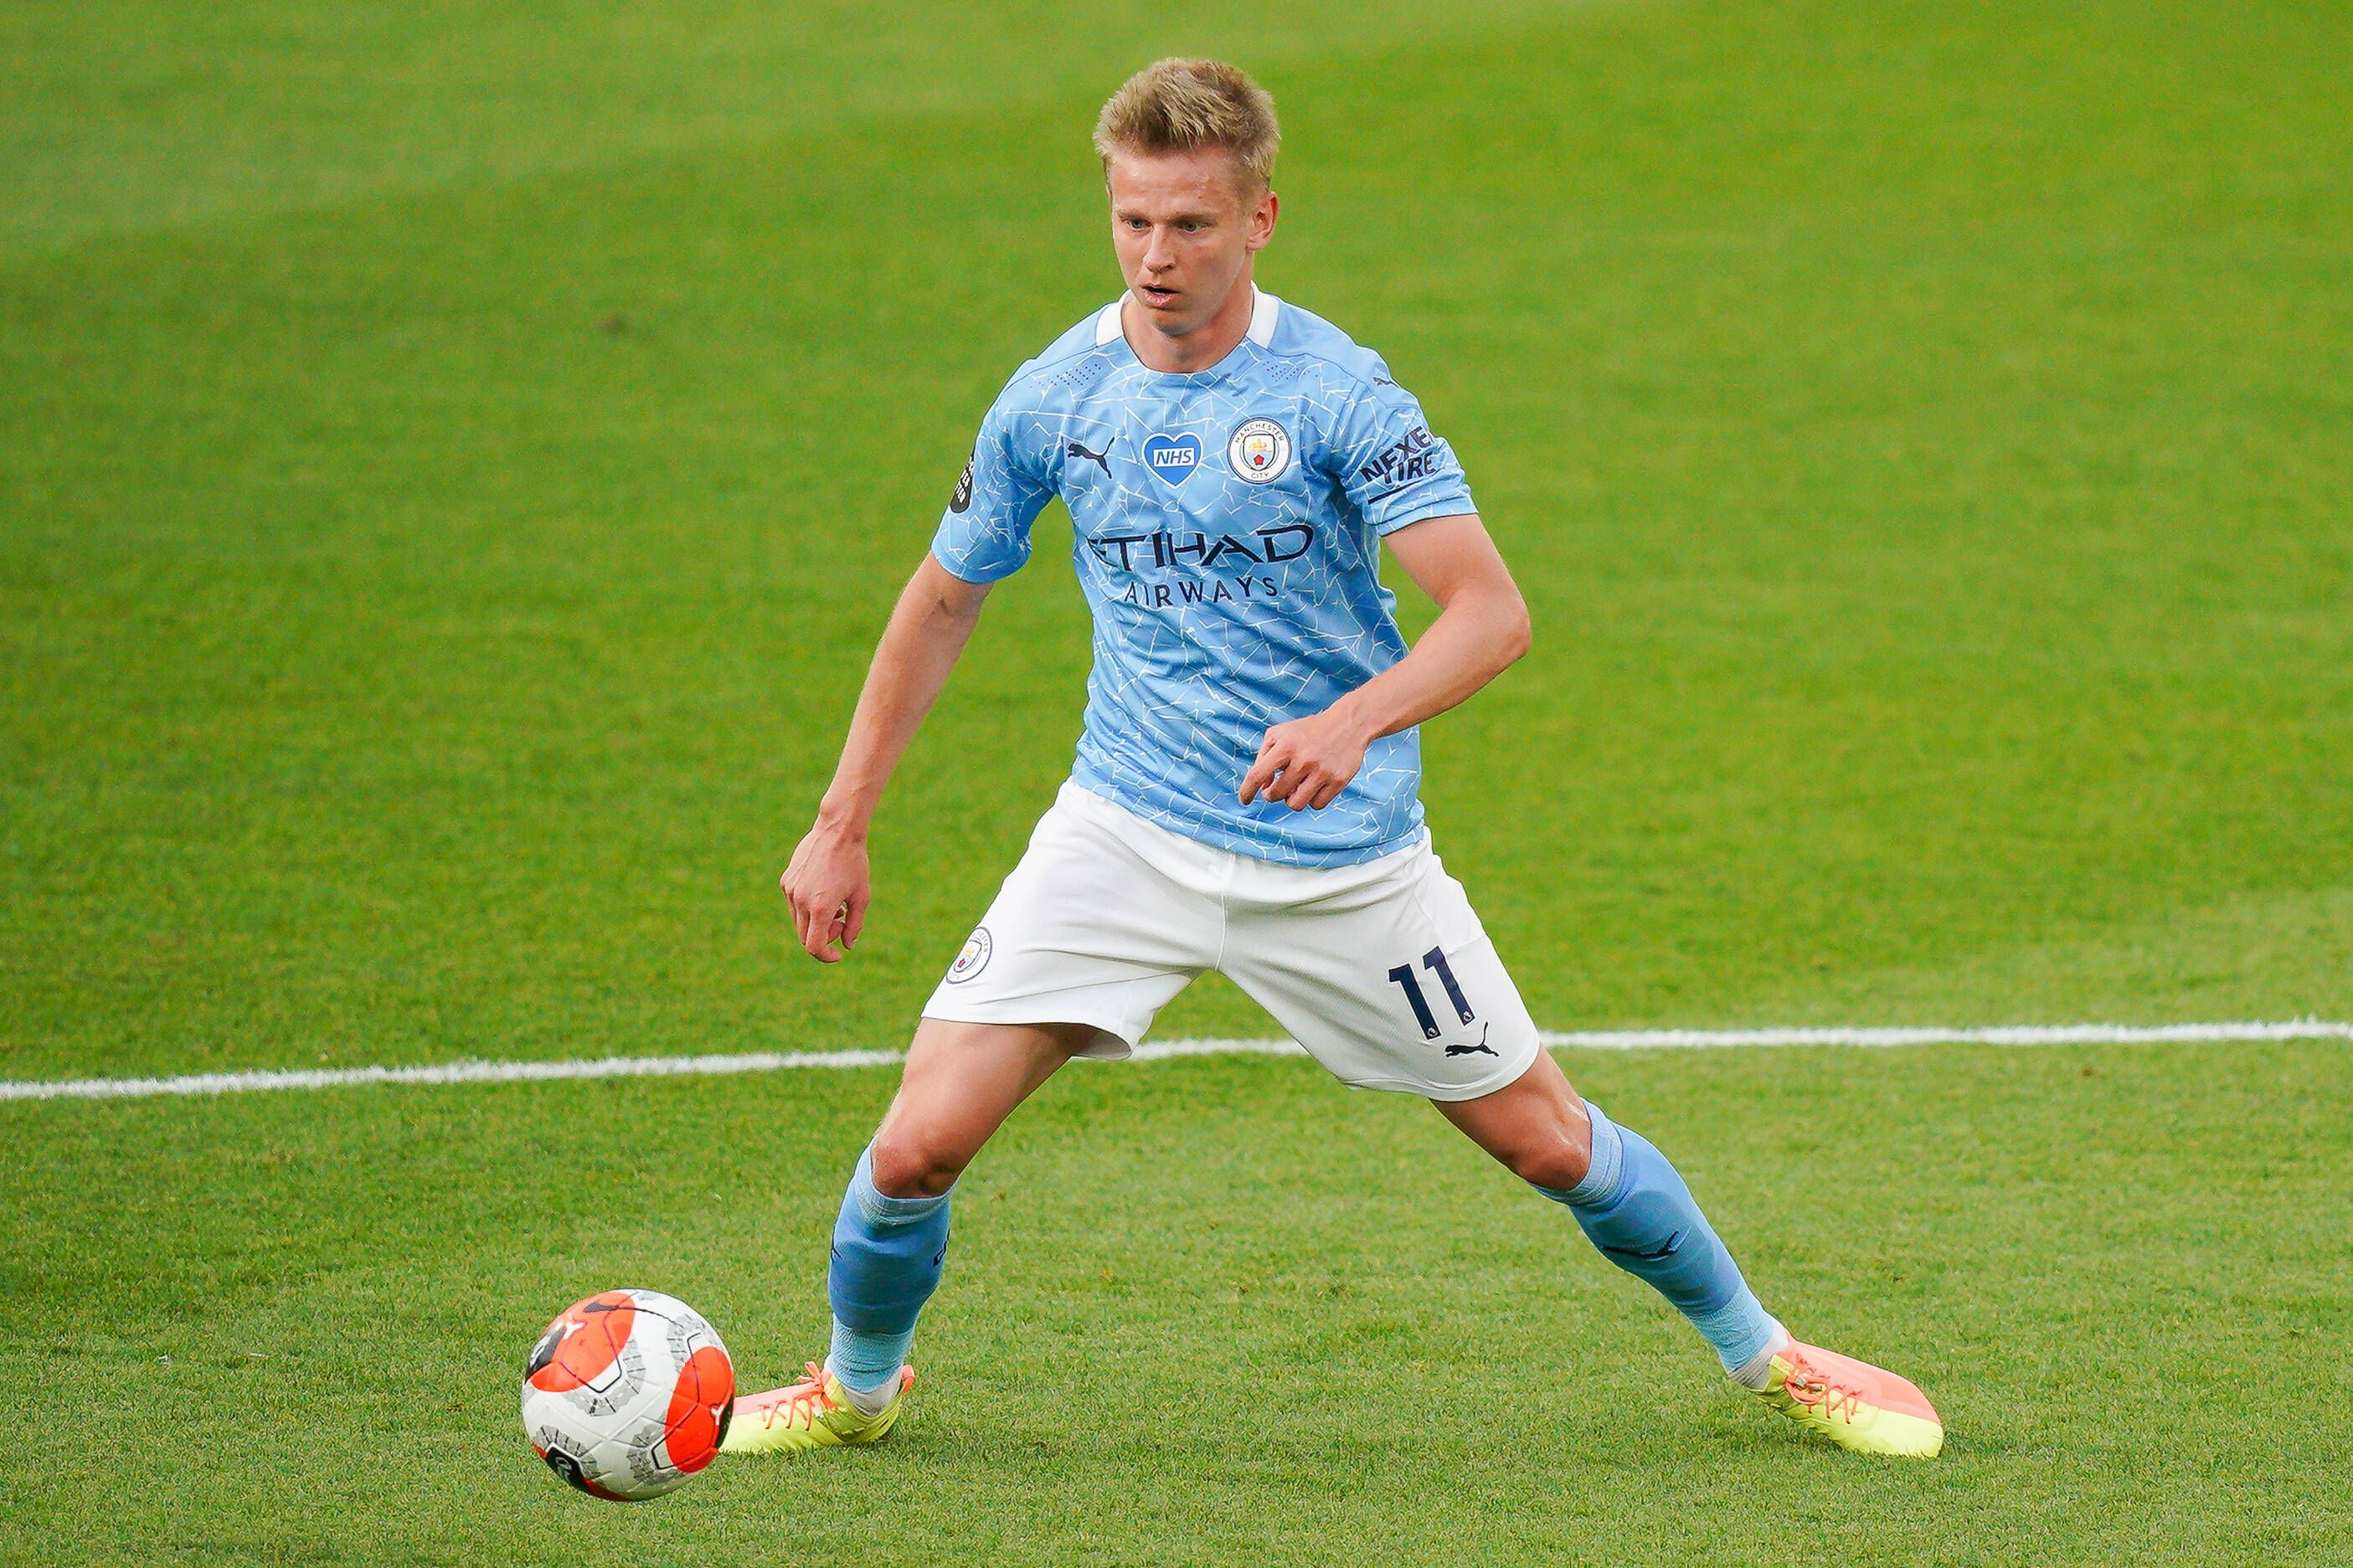 Манчестер Сити предложит Зинченко пятилетний контракт